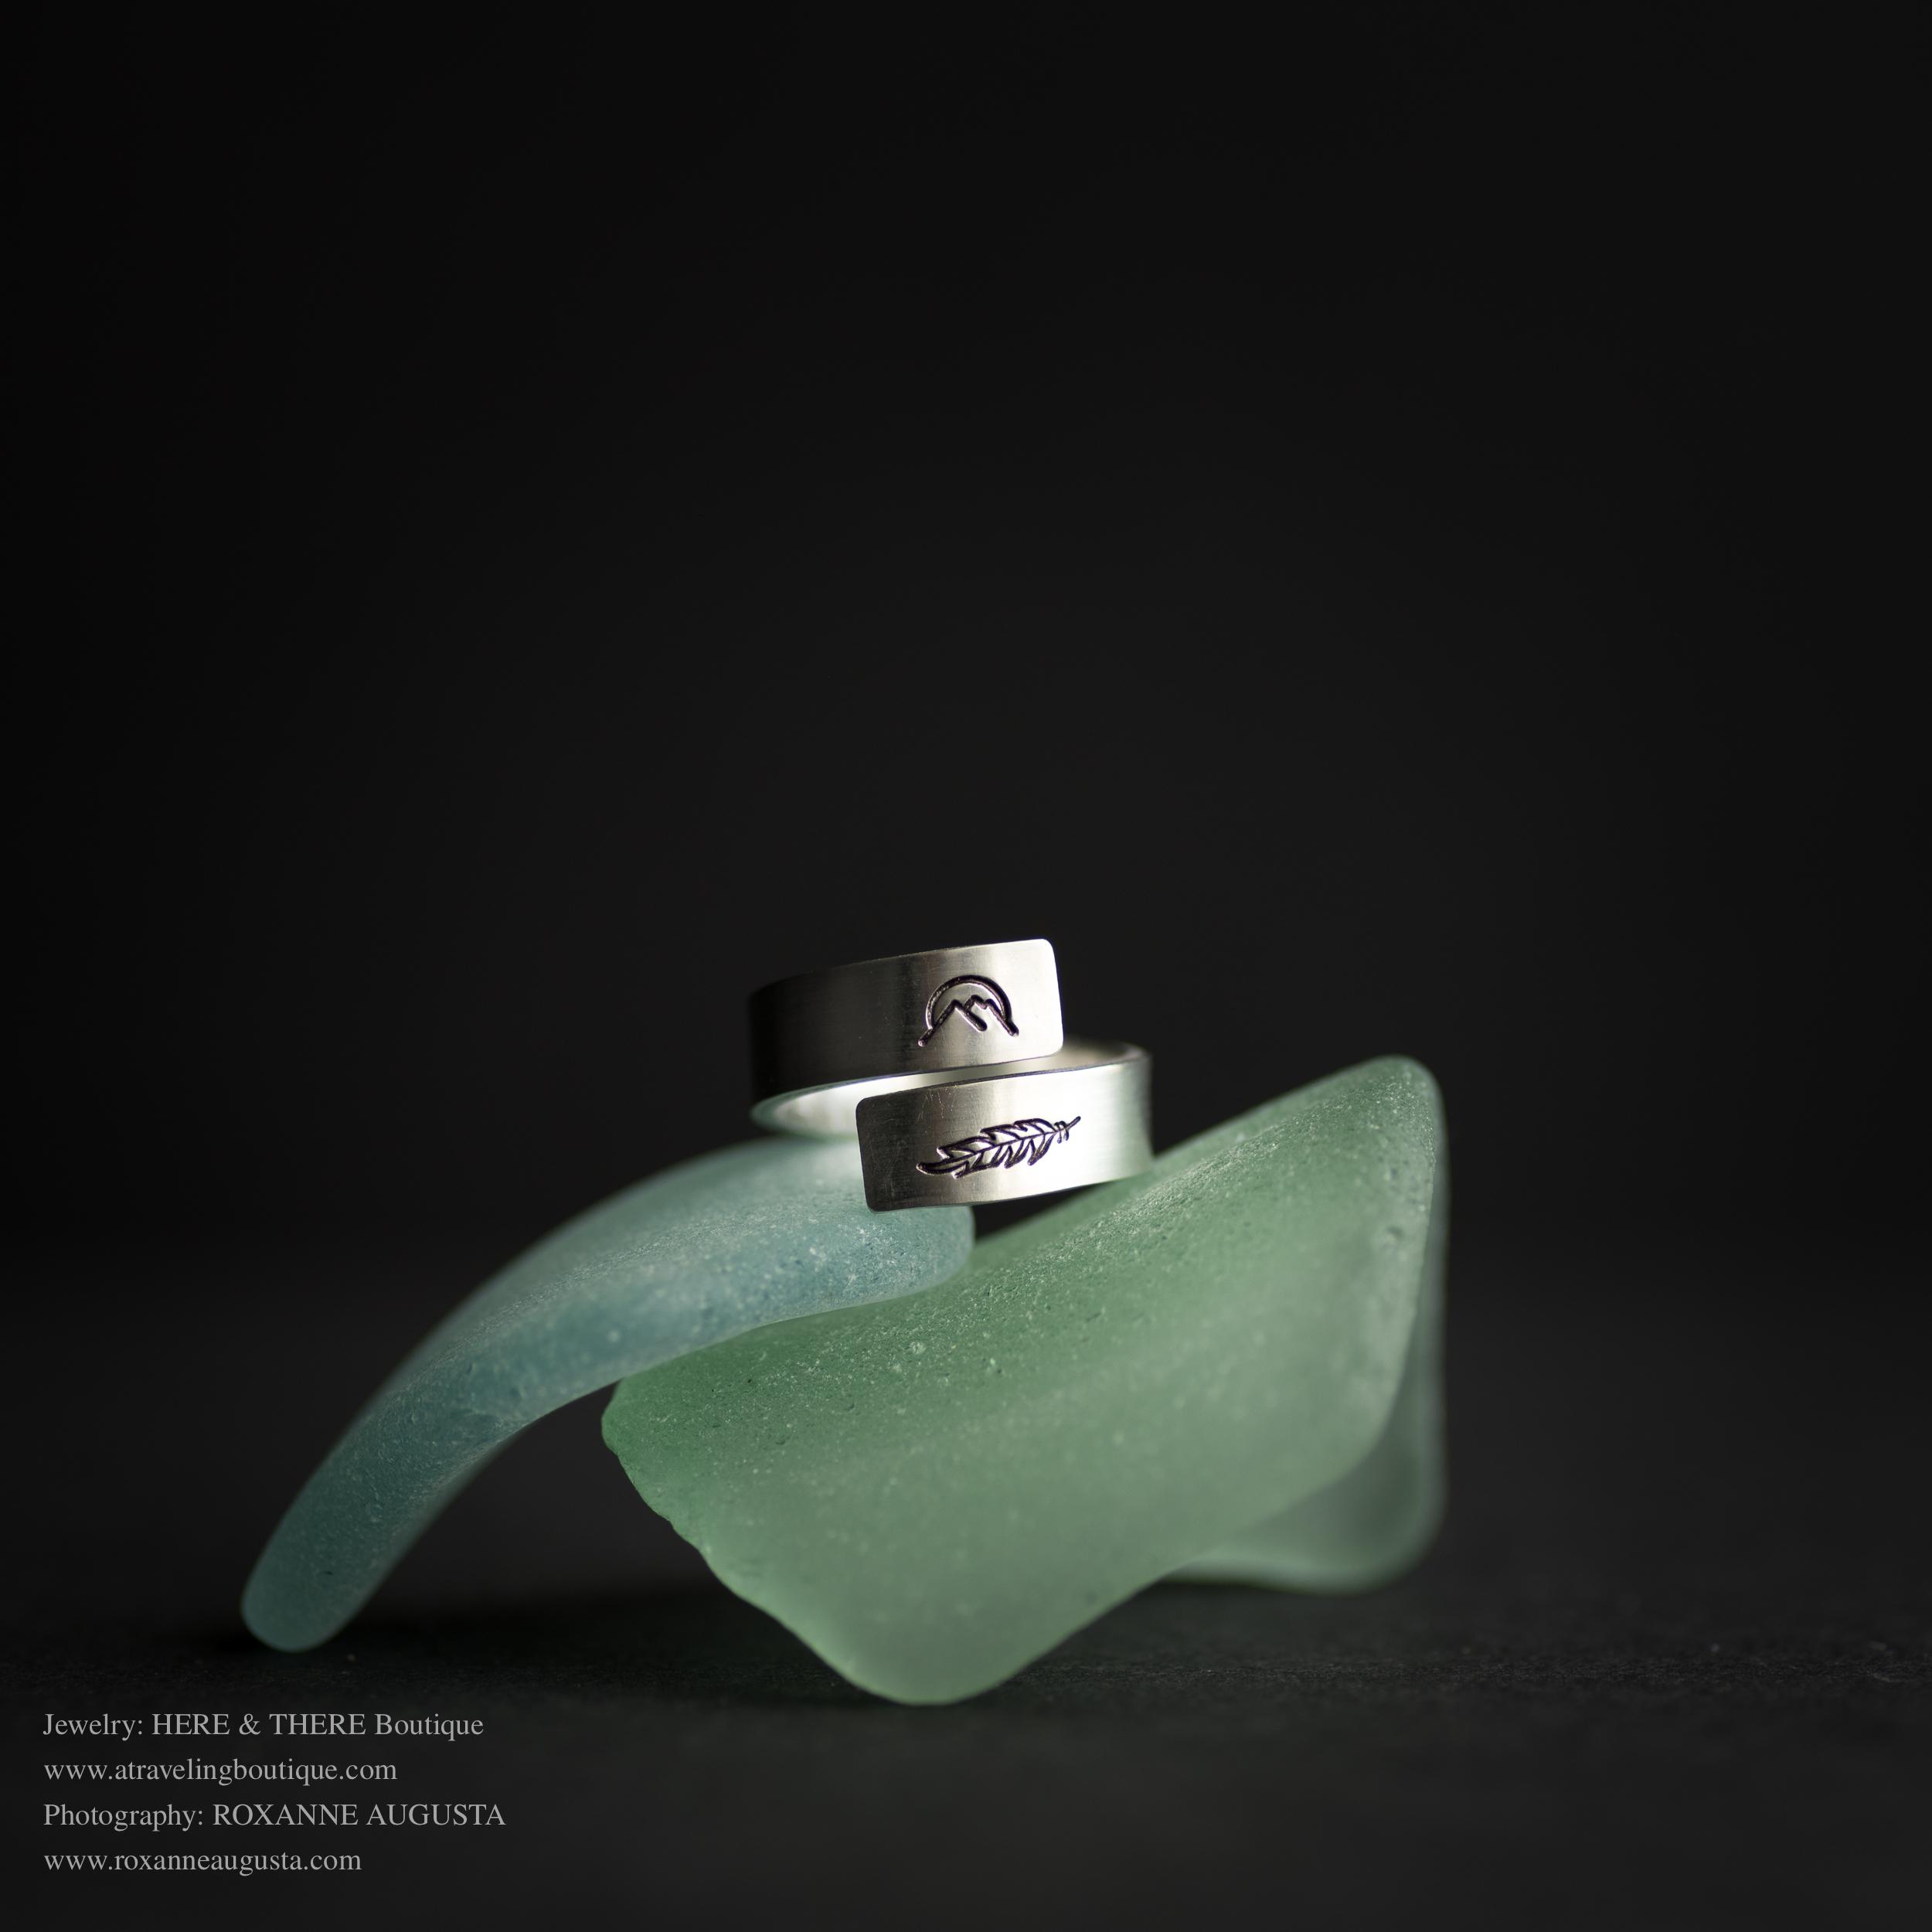 H&TJewelryProductPhotography-ROXANNEAUGUSTA-3.jpg